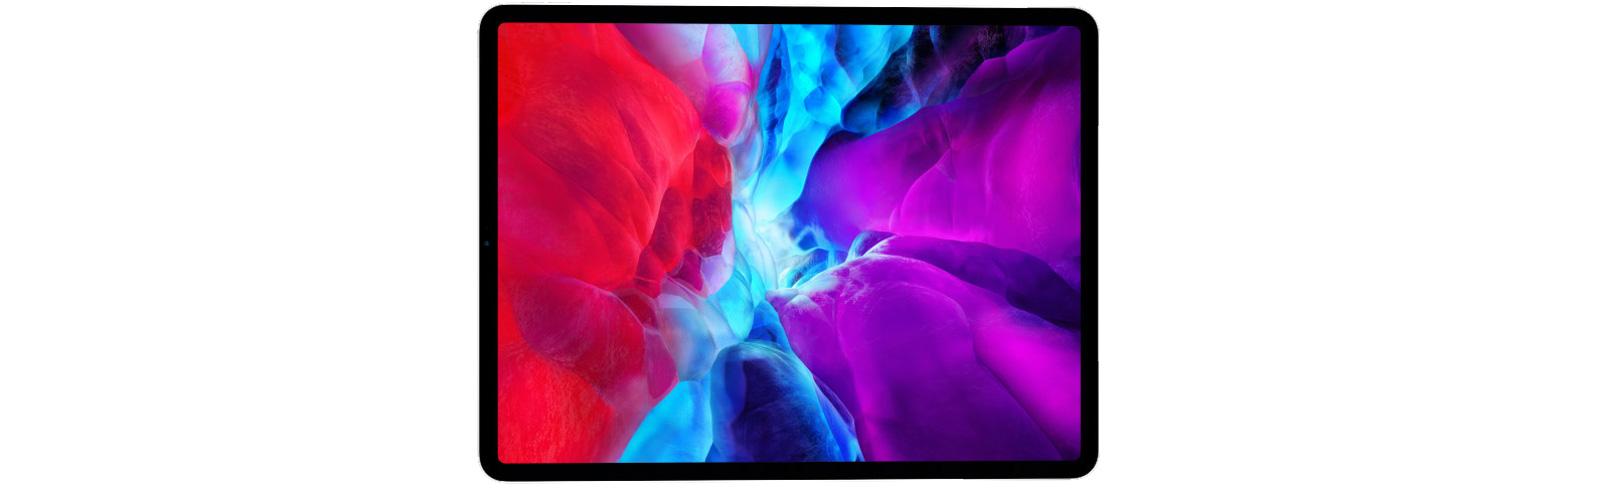 Apple will use LG Mini-LED displays for the iPad Pro